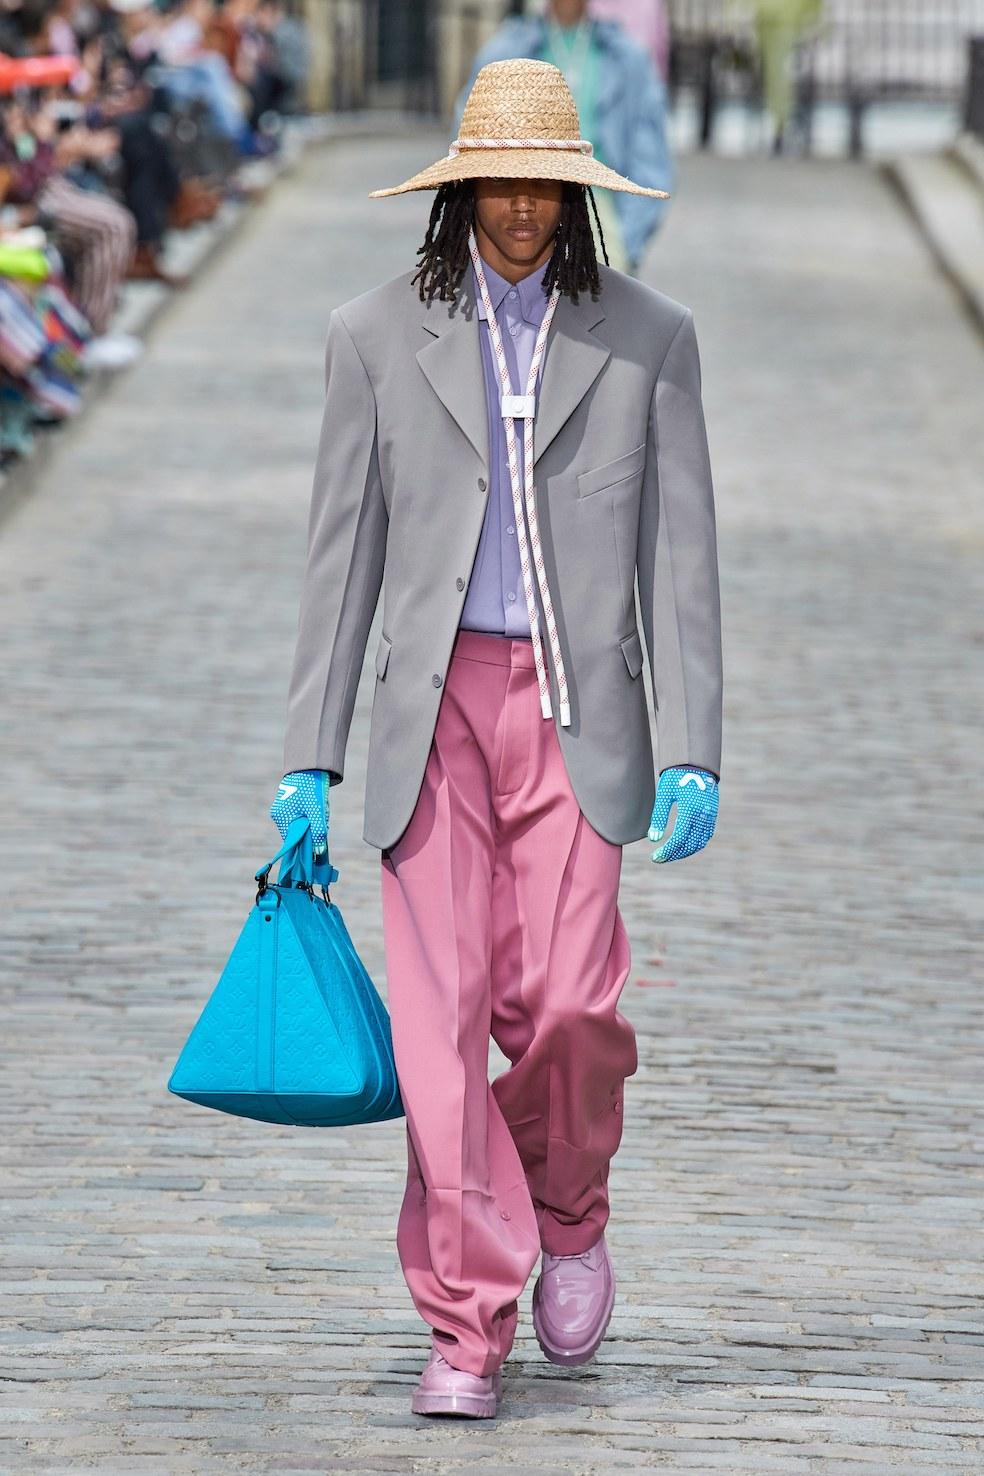 Louis_Vuitton_SS20_Behind_The_Blinds_Magazine__FIO0060.jpg